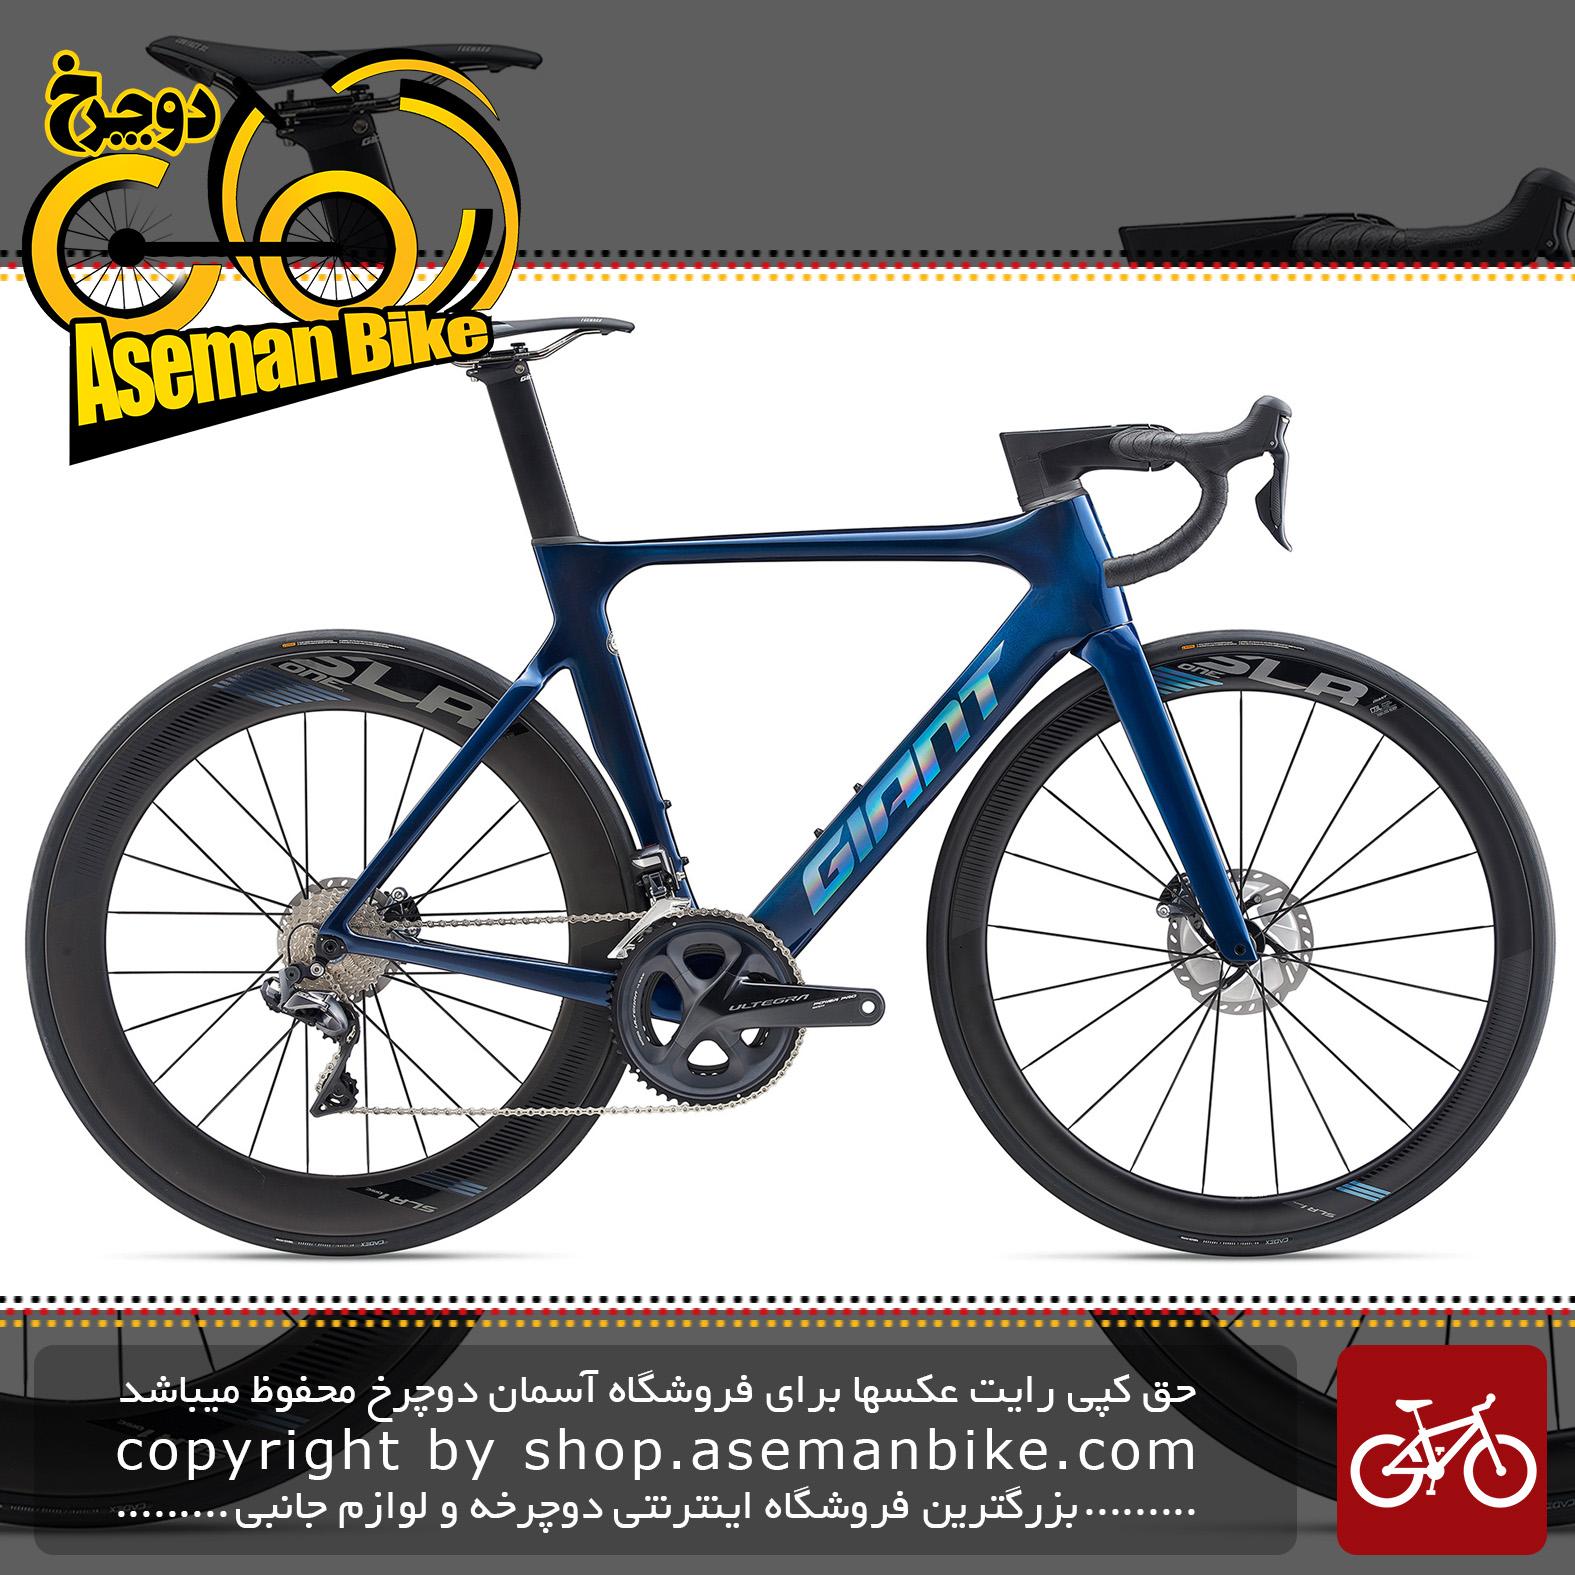 دوچرخه کورسی جاده جاینت مدل پروپل ادونس پرو 1 دیسک هیدرولیک 2020 Giant Road Bicycle Propel Advanced Pro 1 Disc 2020